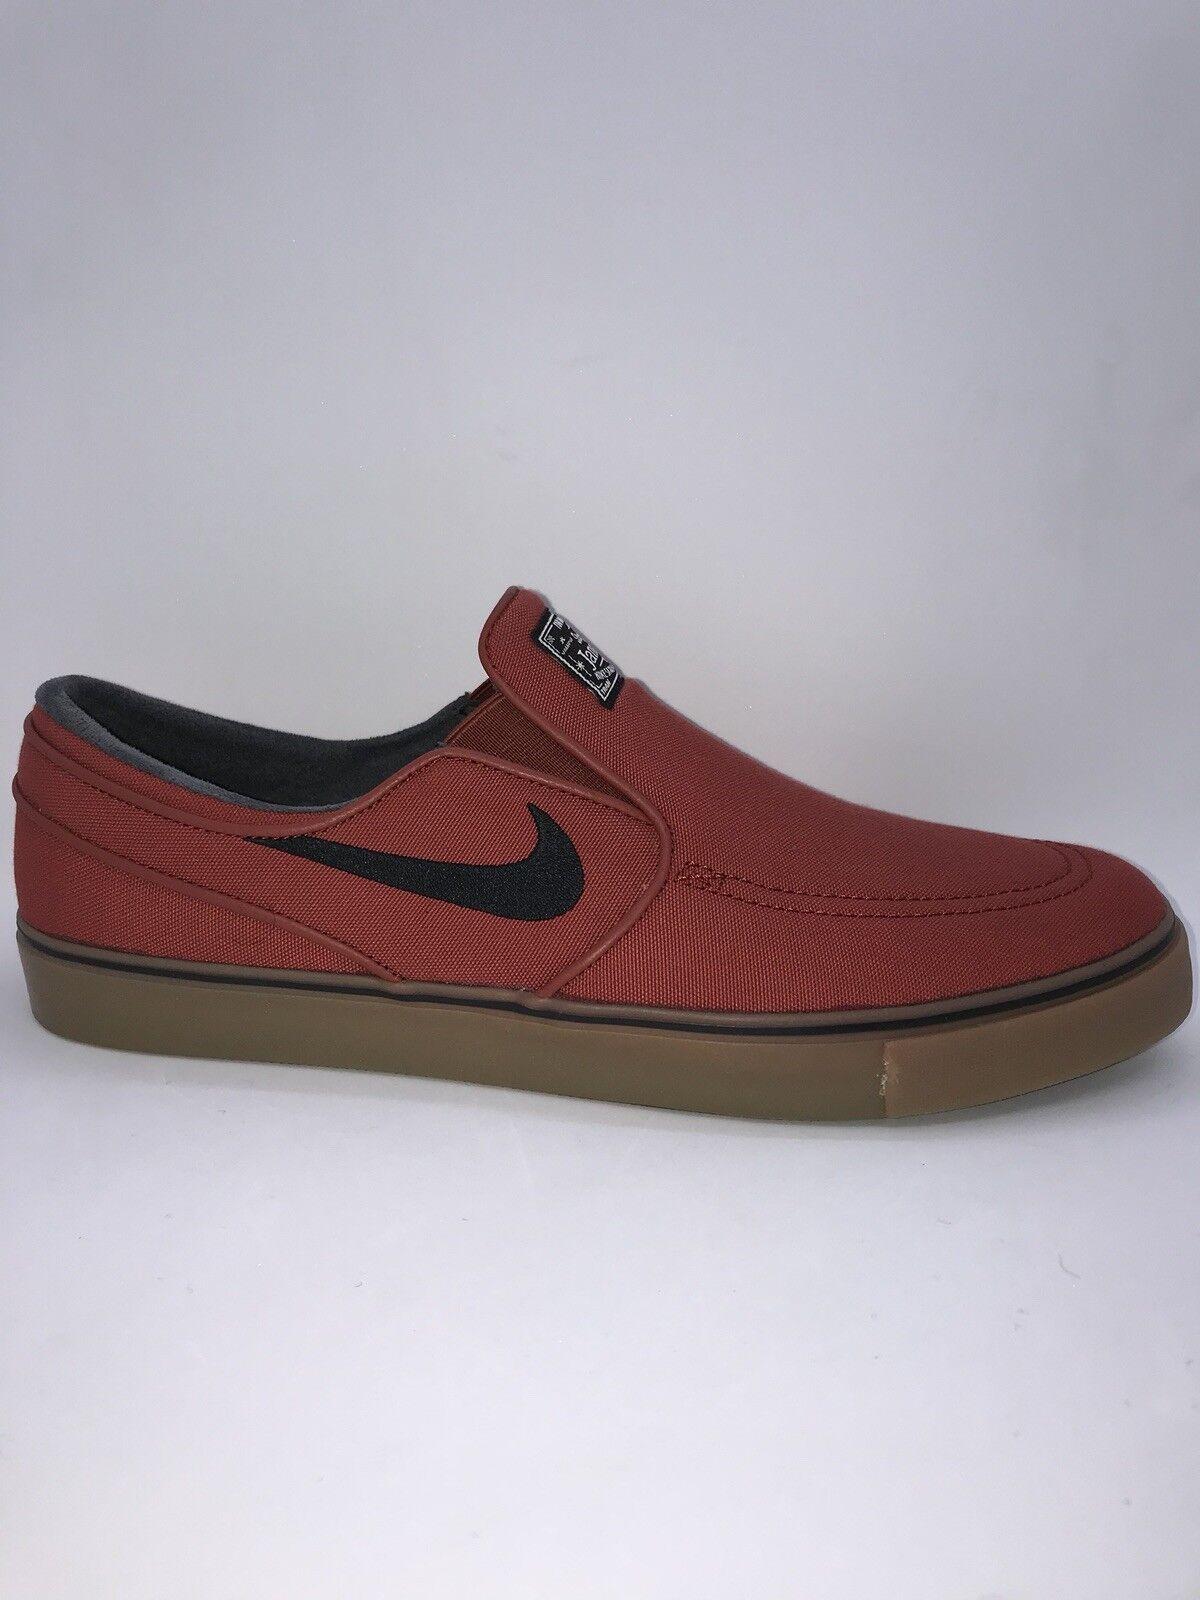 Nike Zoom Stefan Janoski Canvas Red Black